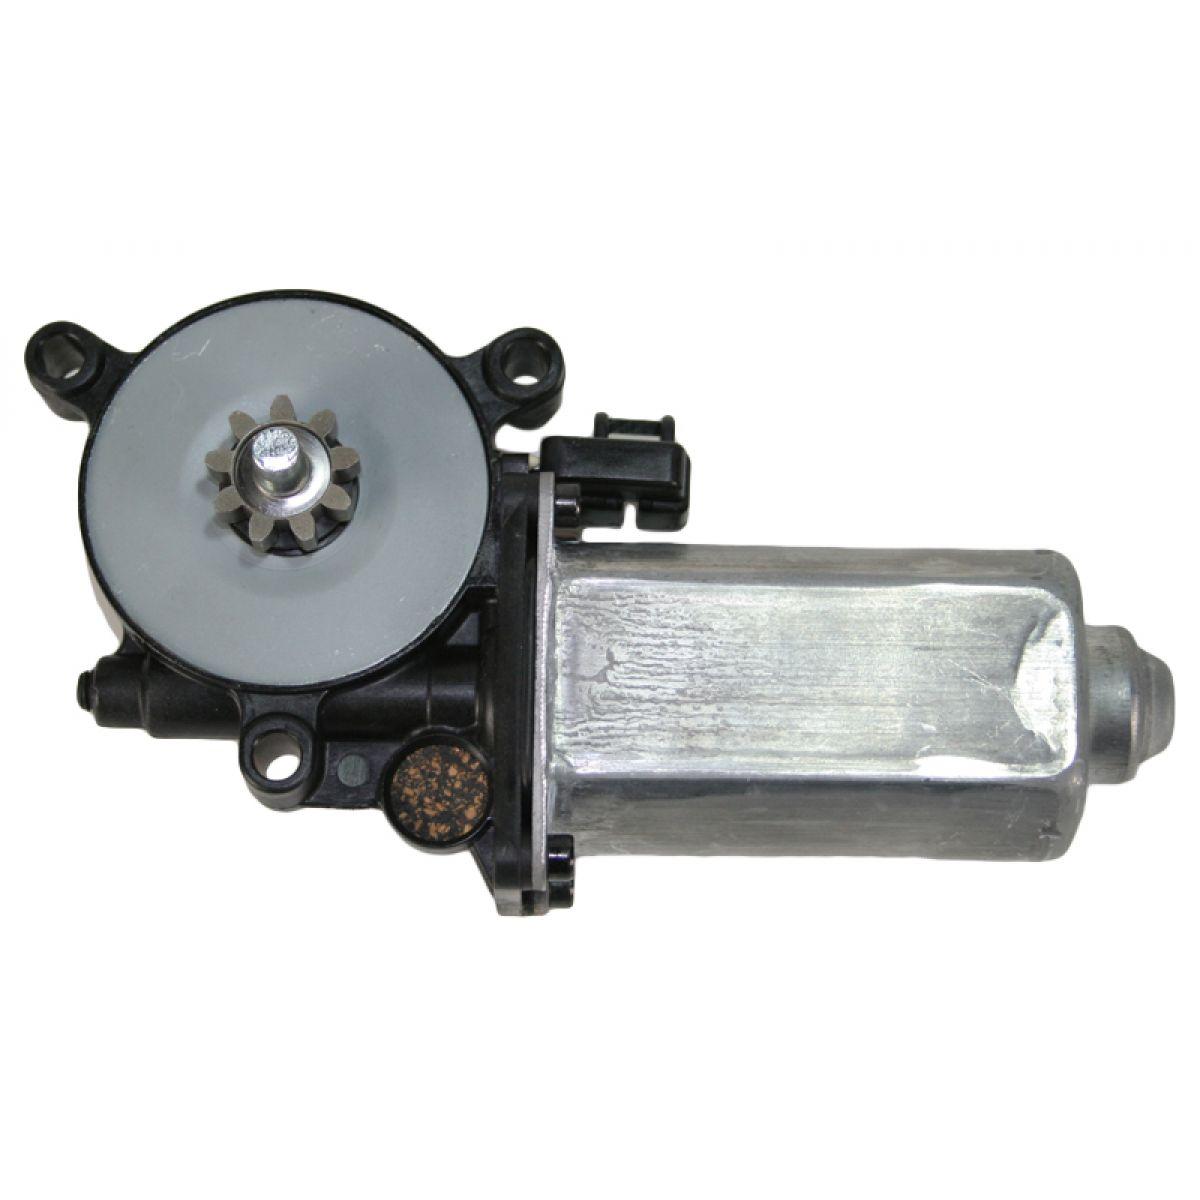 Power window lift motor 22143946 for pontiac buick for 1999 buick park avenue window regulator